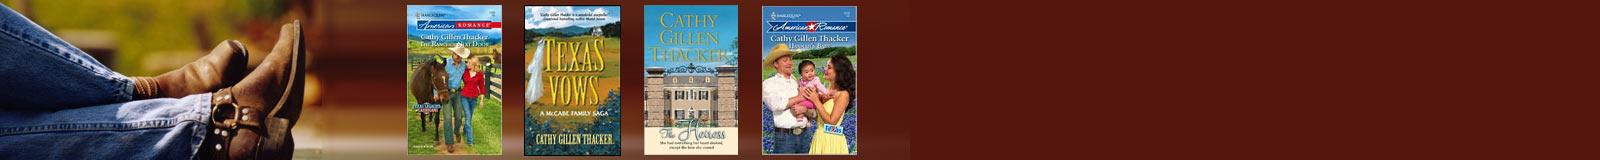 cathy gillen thacker series list